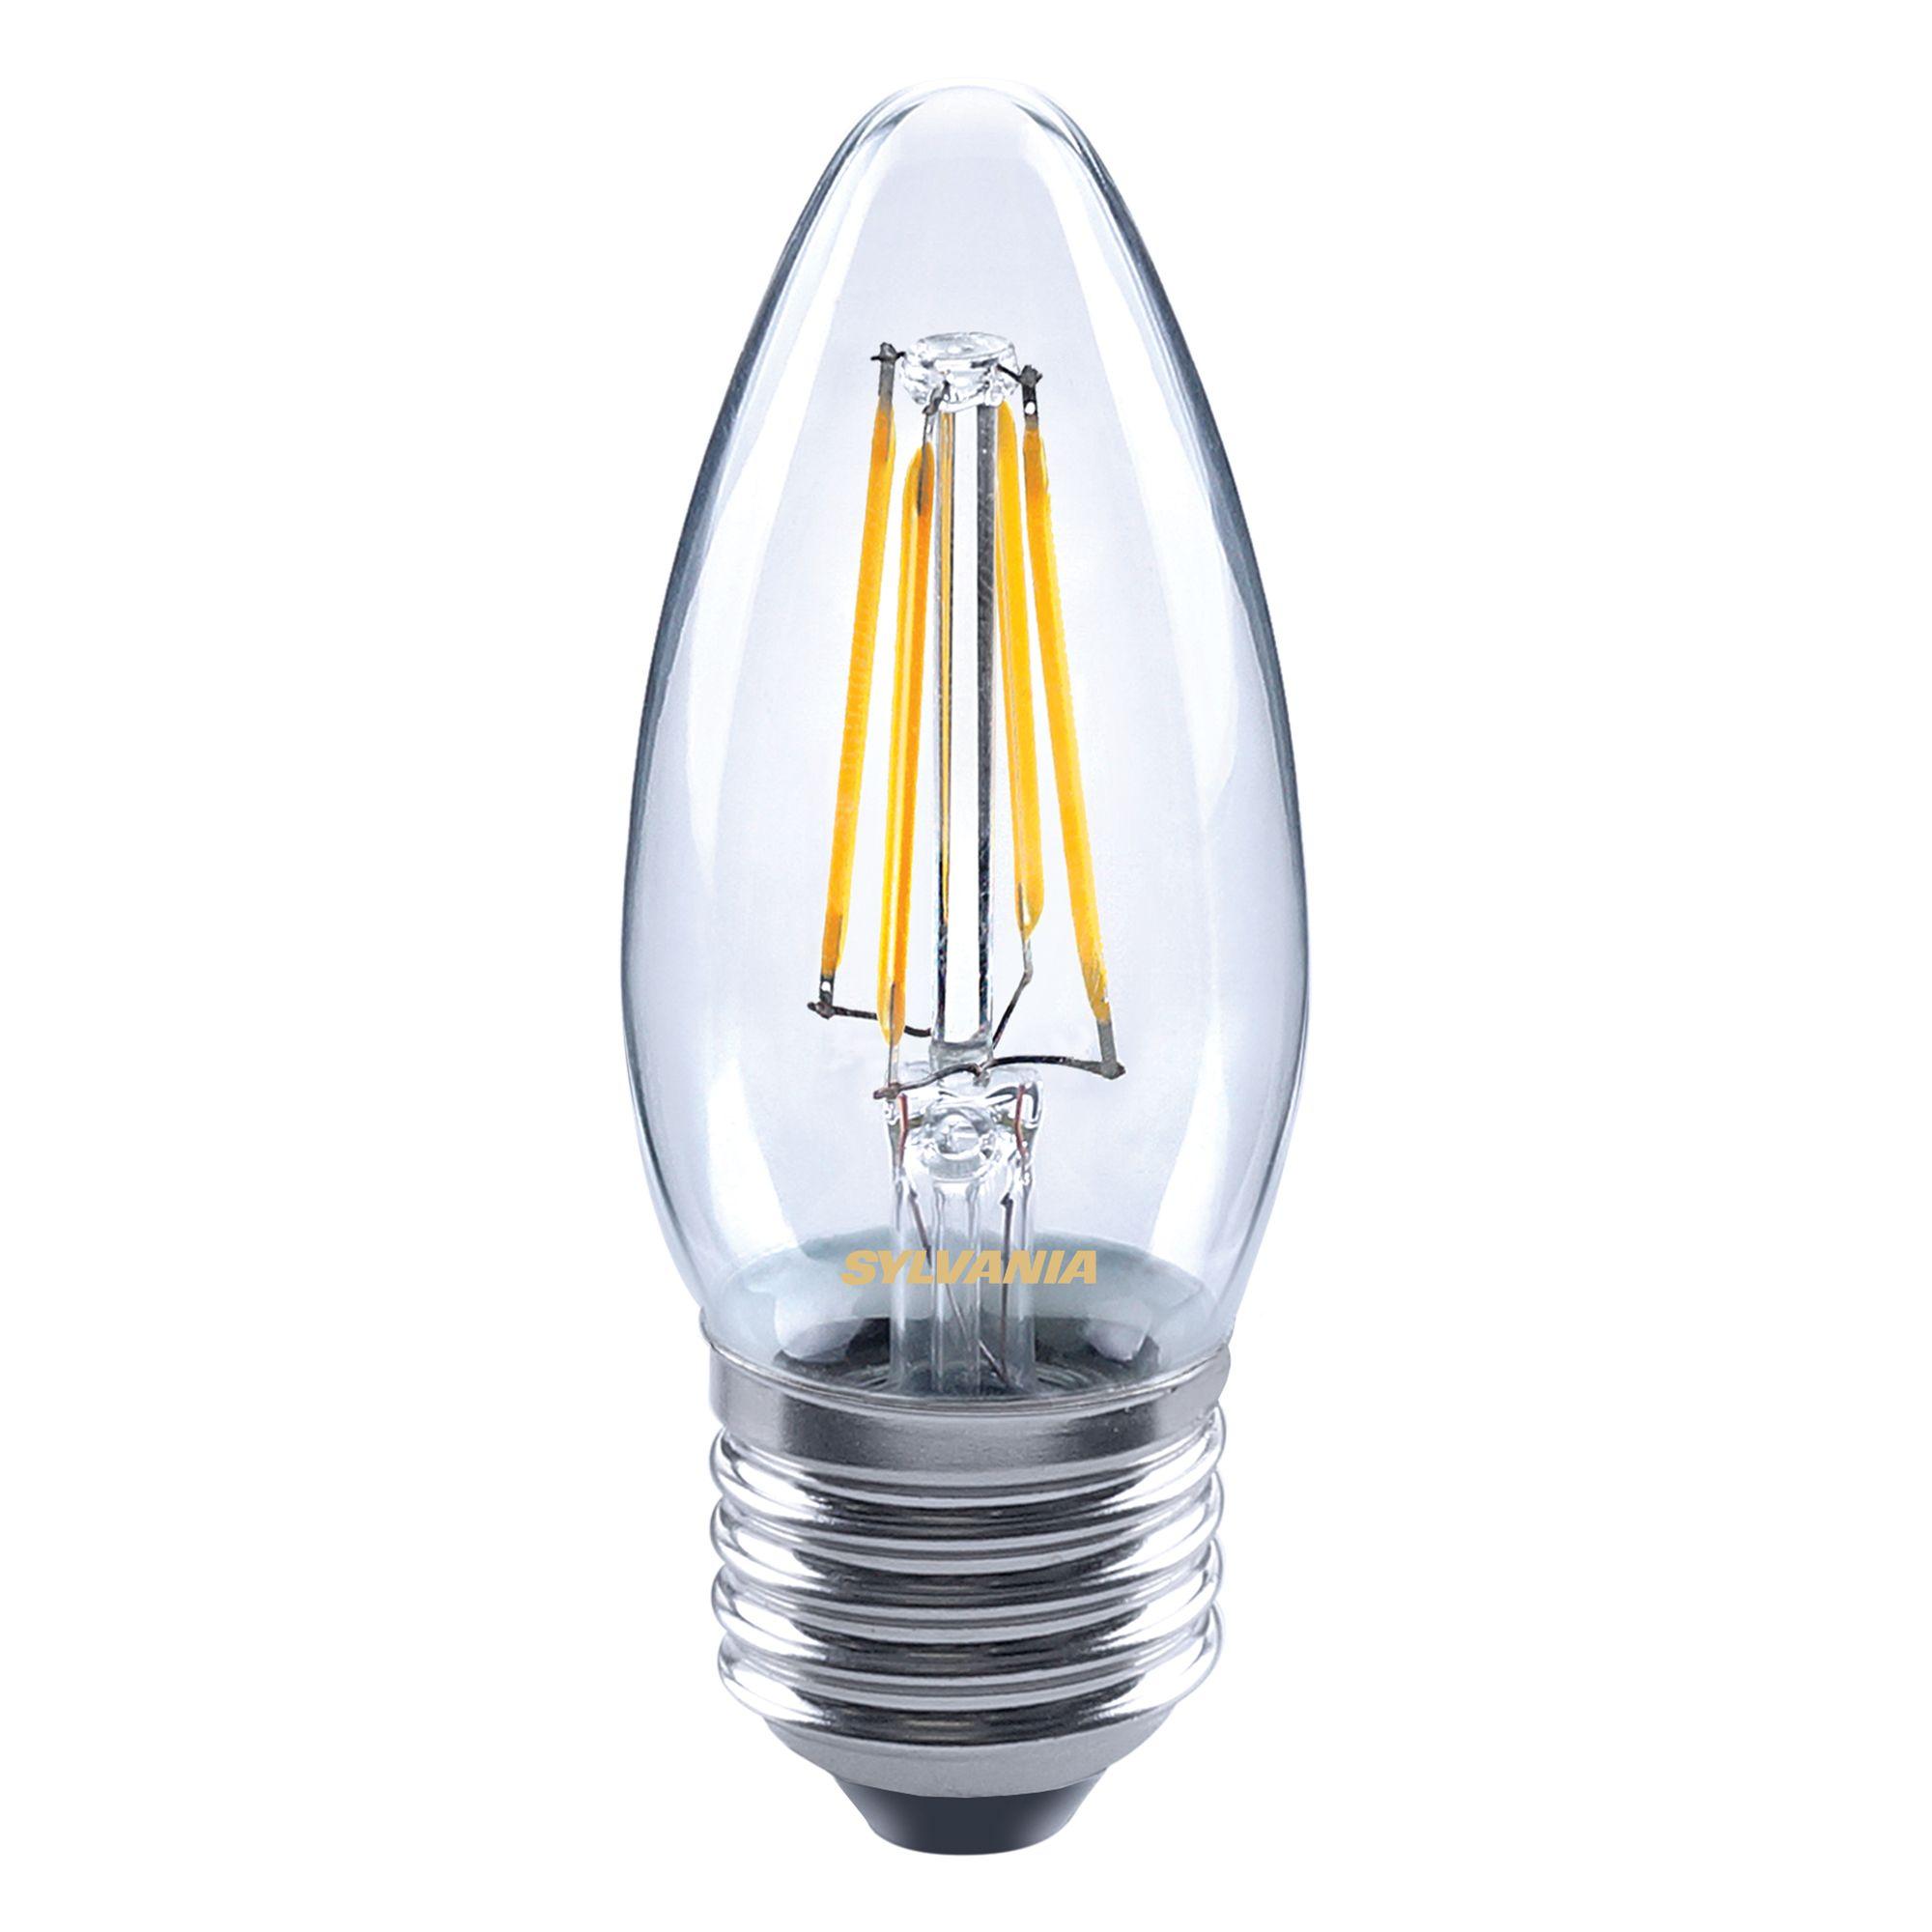 diall edison screw cap e27 5w led filament gls light. Black Bedroom Furniture Sets. Home Design Ideas